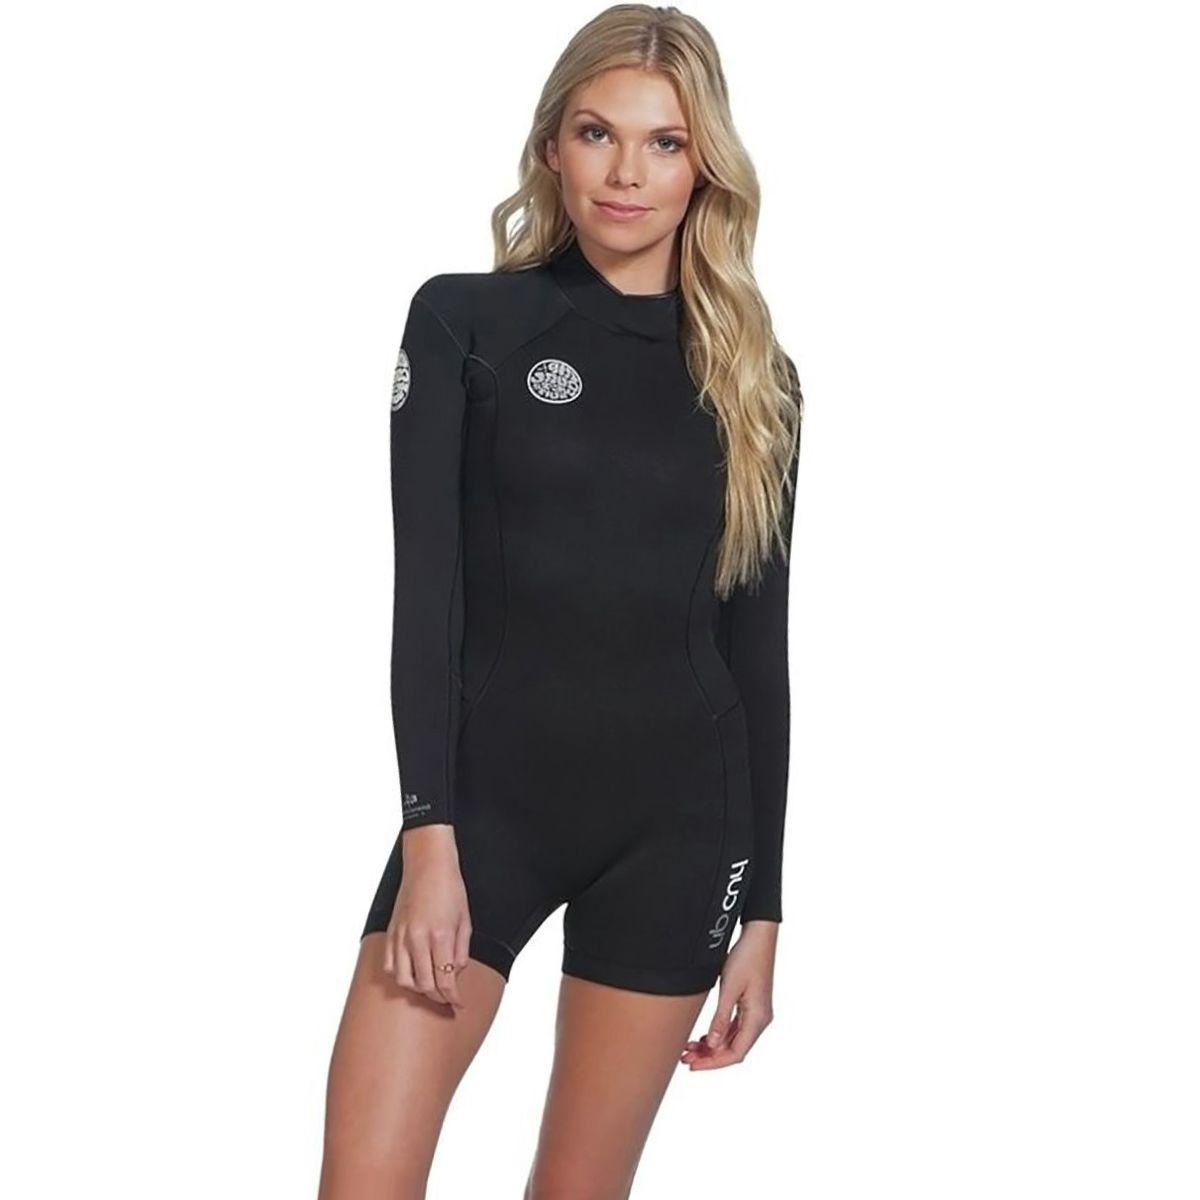 Rip Curl Dawn Patrol 2/3 Long-Sleeve Spring Wetsuit - Women's